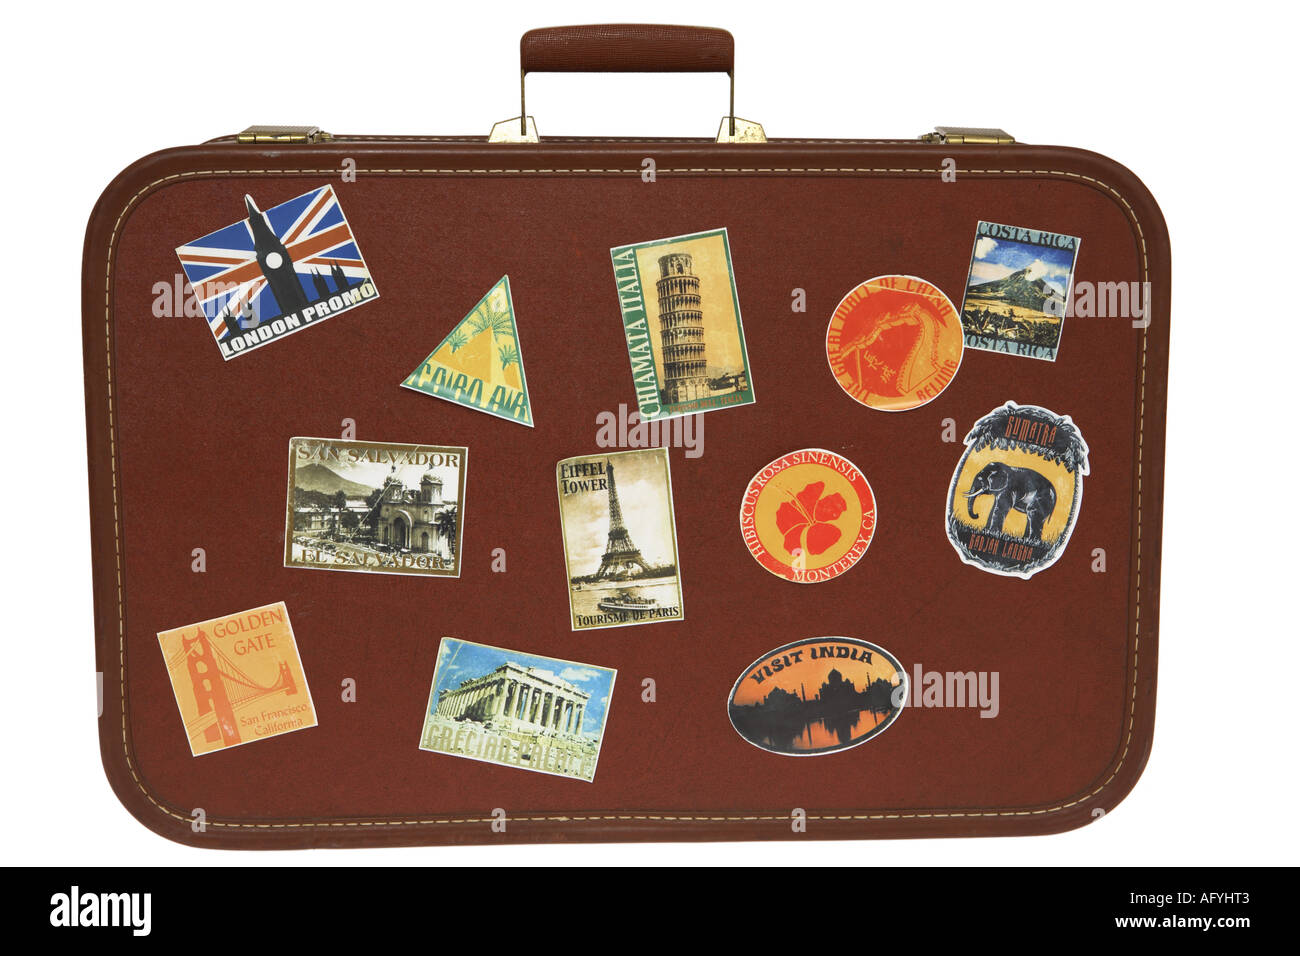 vintage suitcase stickers stock photos vintage suitcase stickers